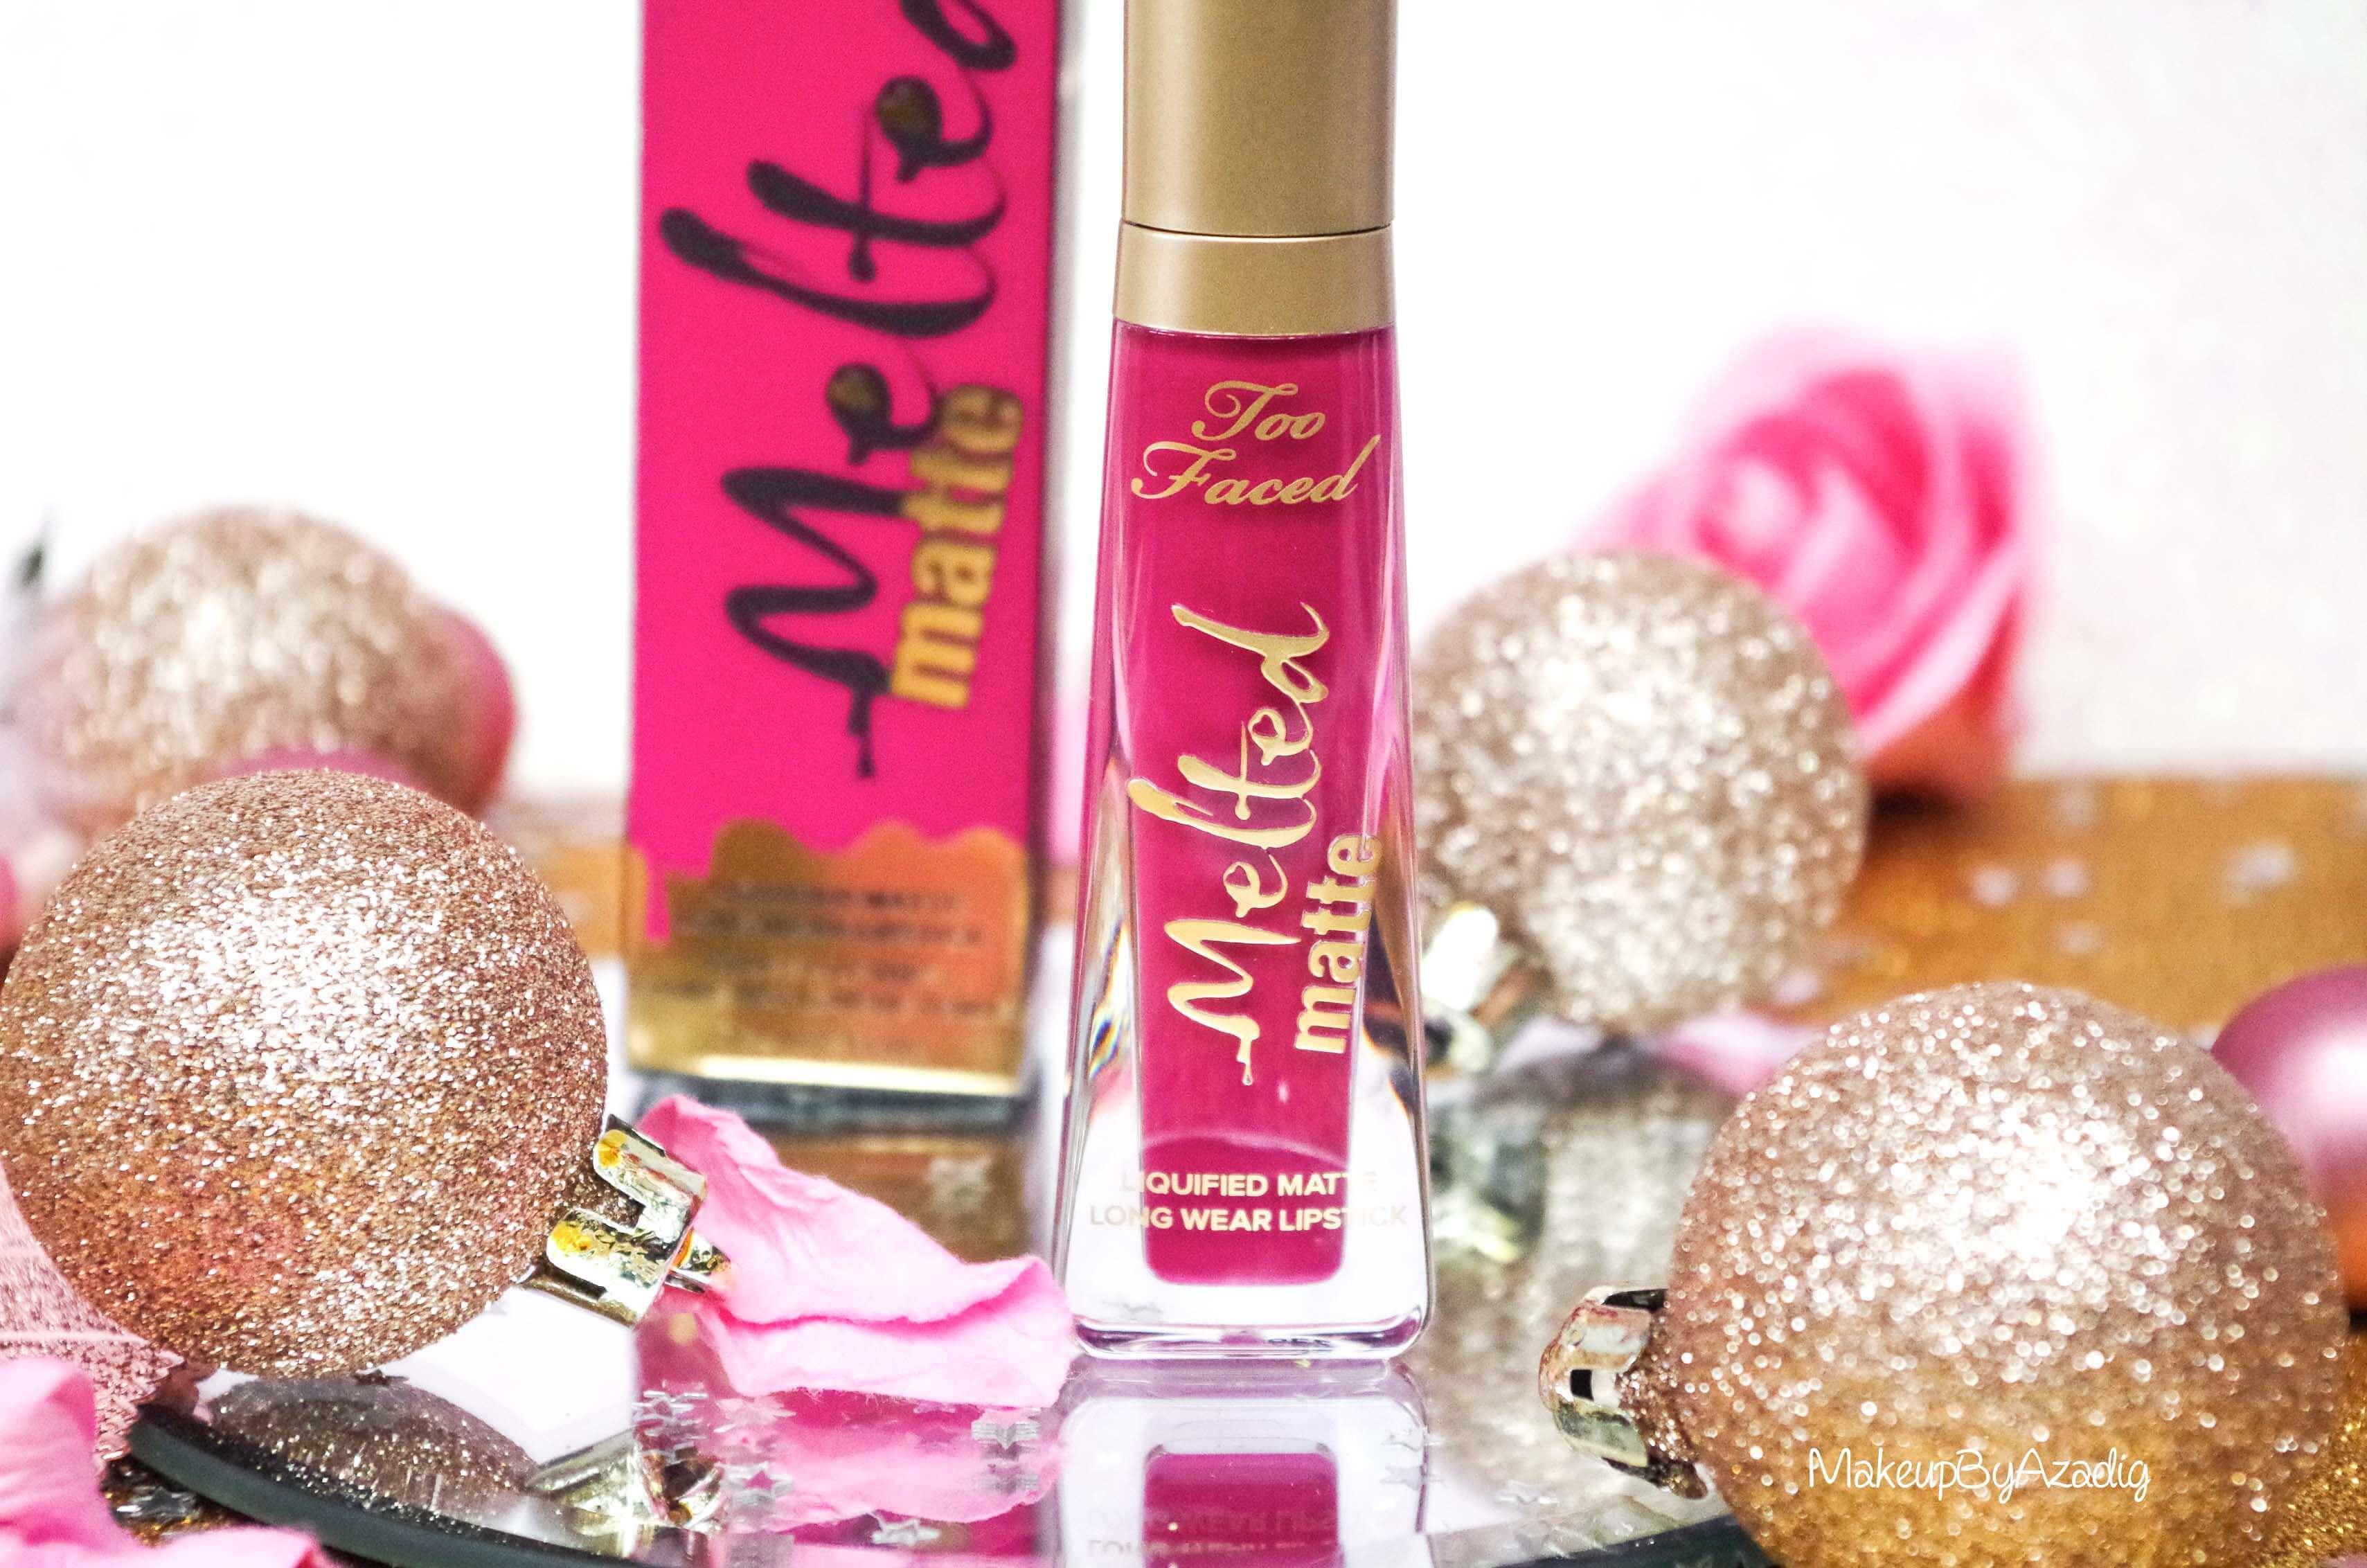 makeupbyazadig-melted-matte-queenb-bendandsnap-influencer-too-faced-rouge-levres-revue-avis-prix-sephora-paris-blog-liquide-logo